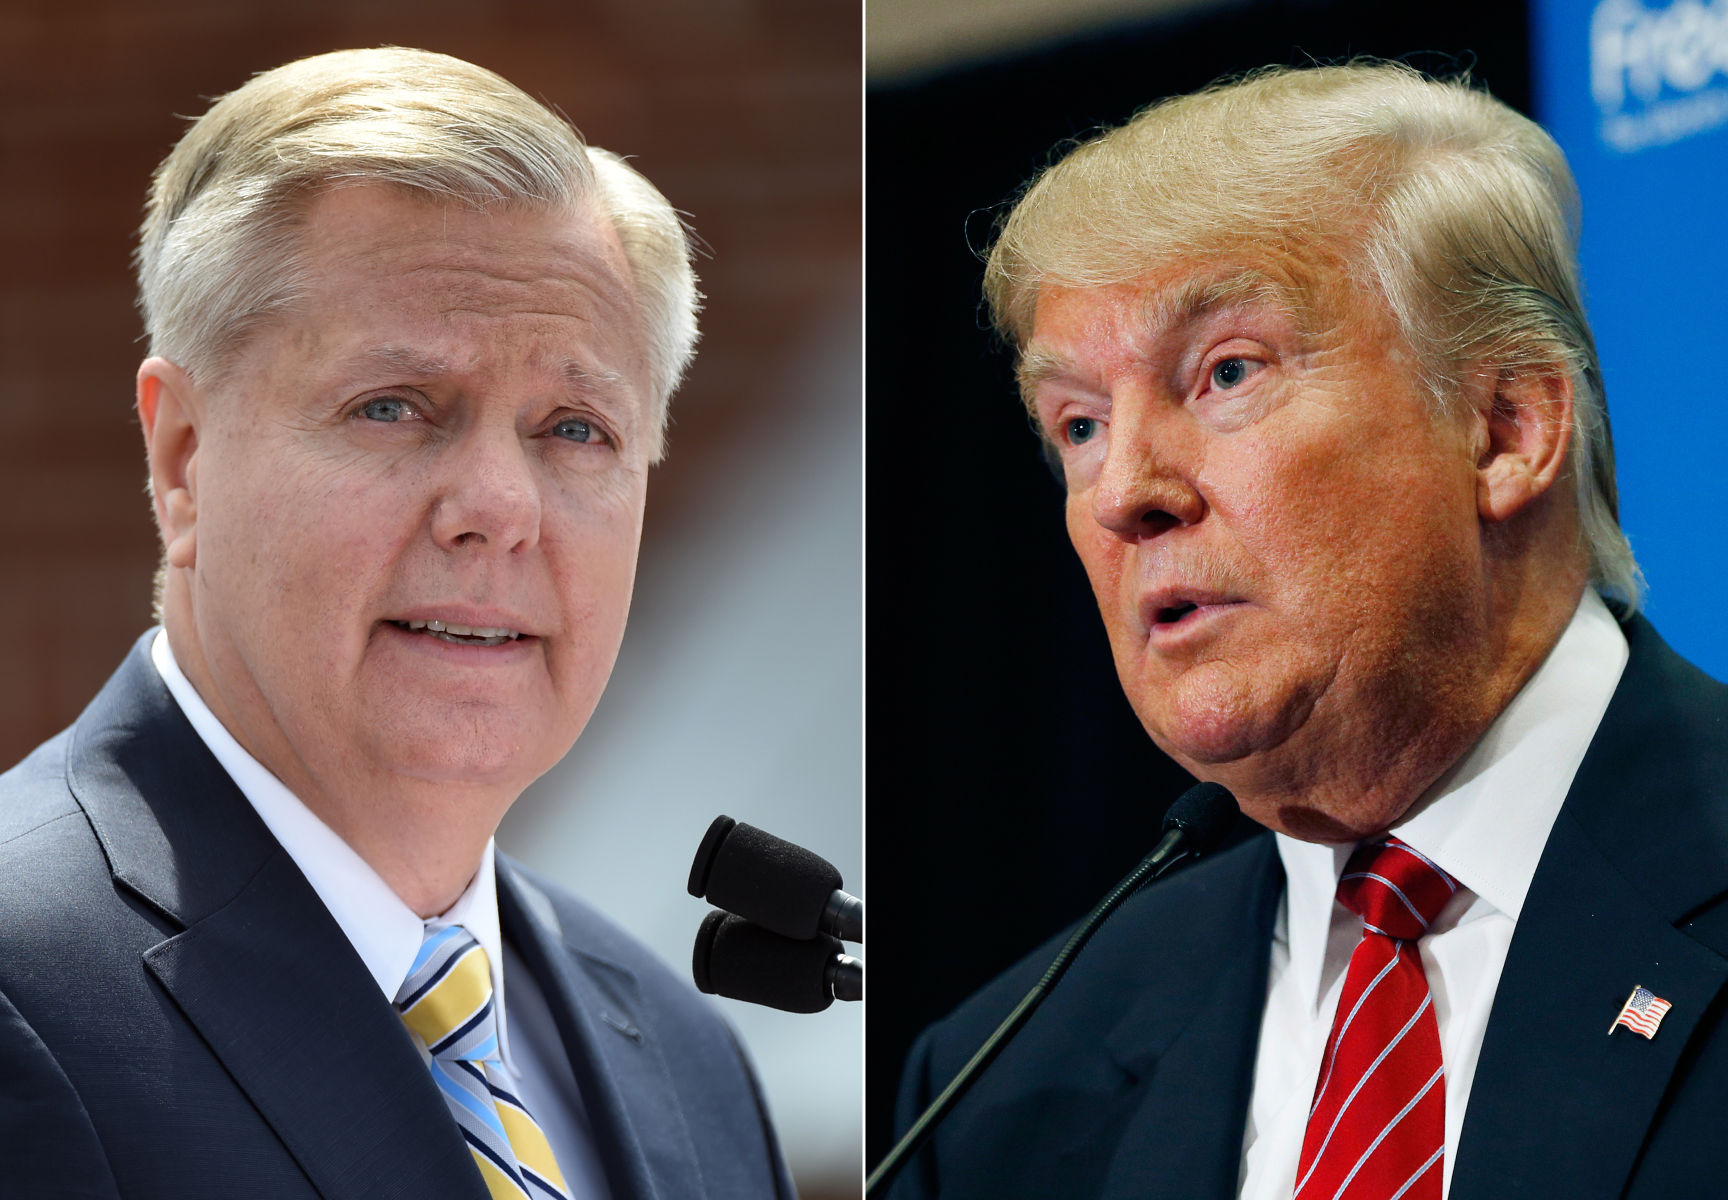 Trump Slams Sen. Graham For 'Disgusting Lie' On Charlottesville Statement